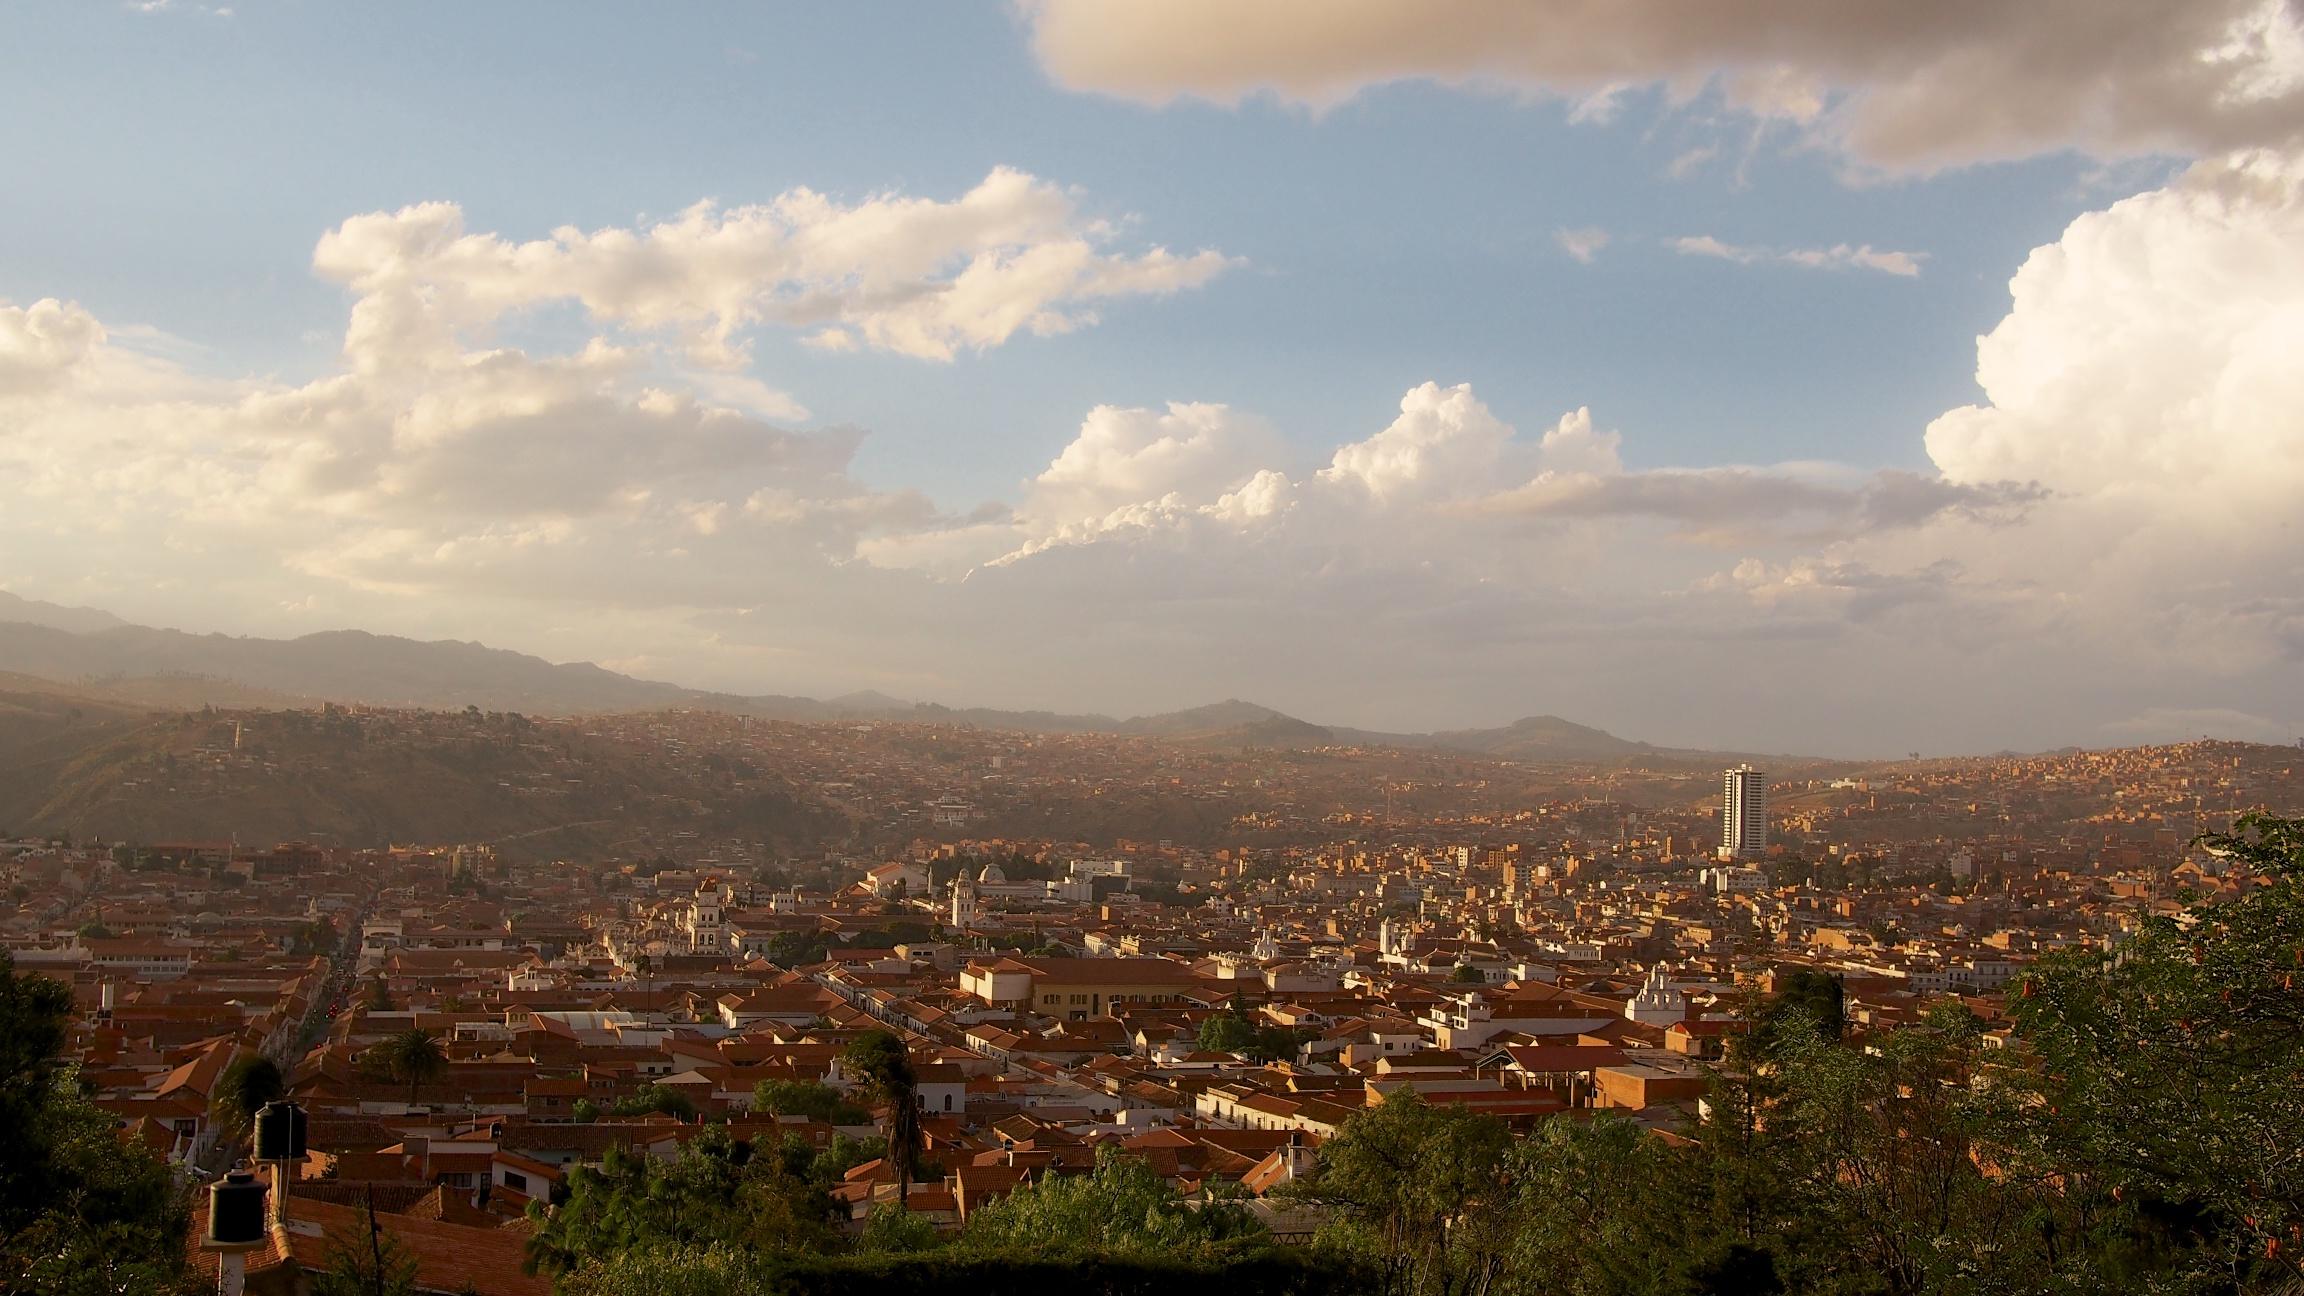 View of the city at dusk from near Recoleta and Plaza Plaza Pedro de Anzúrez